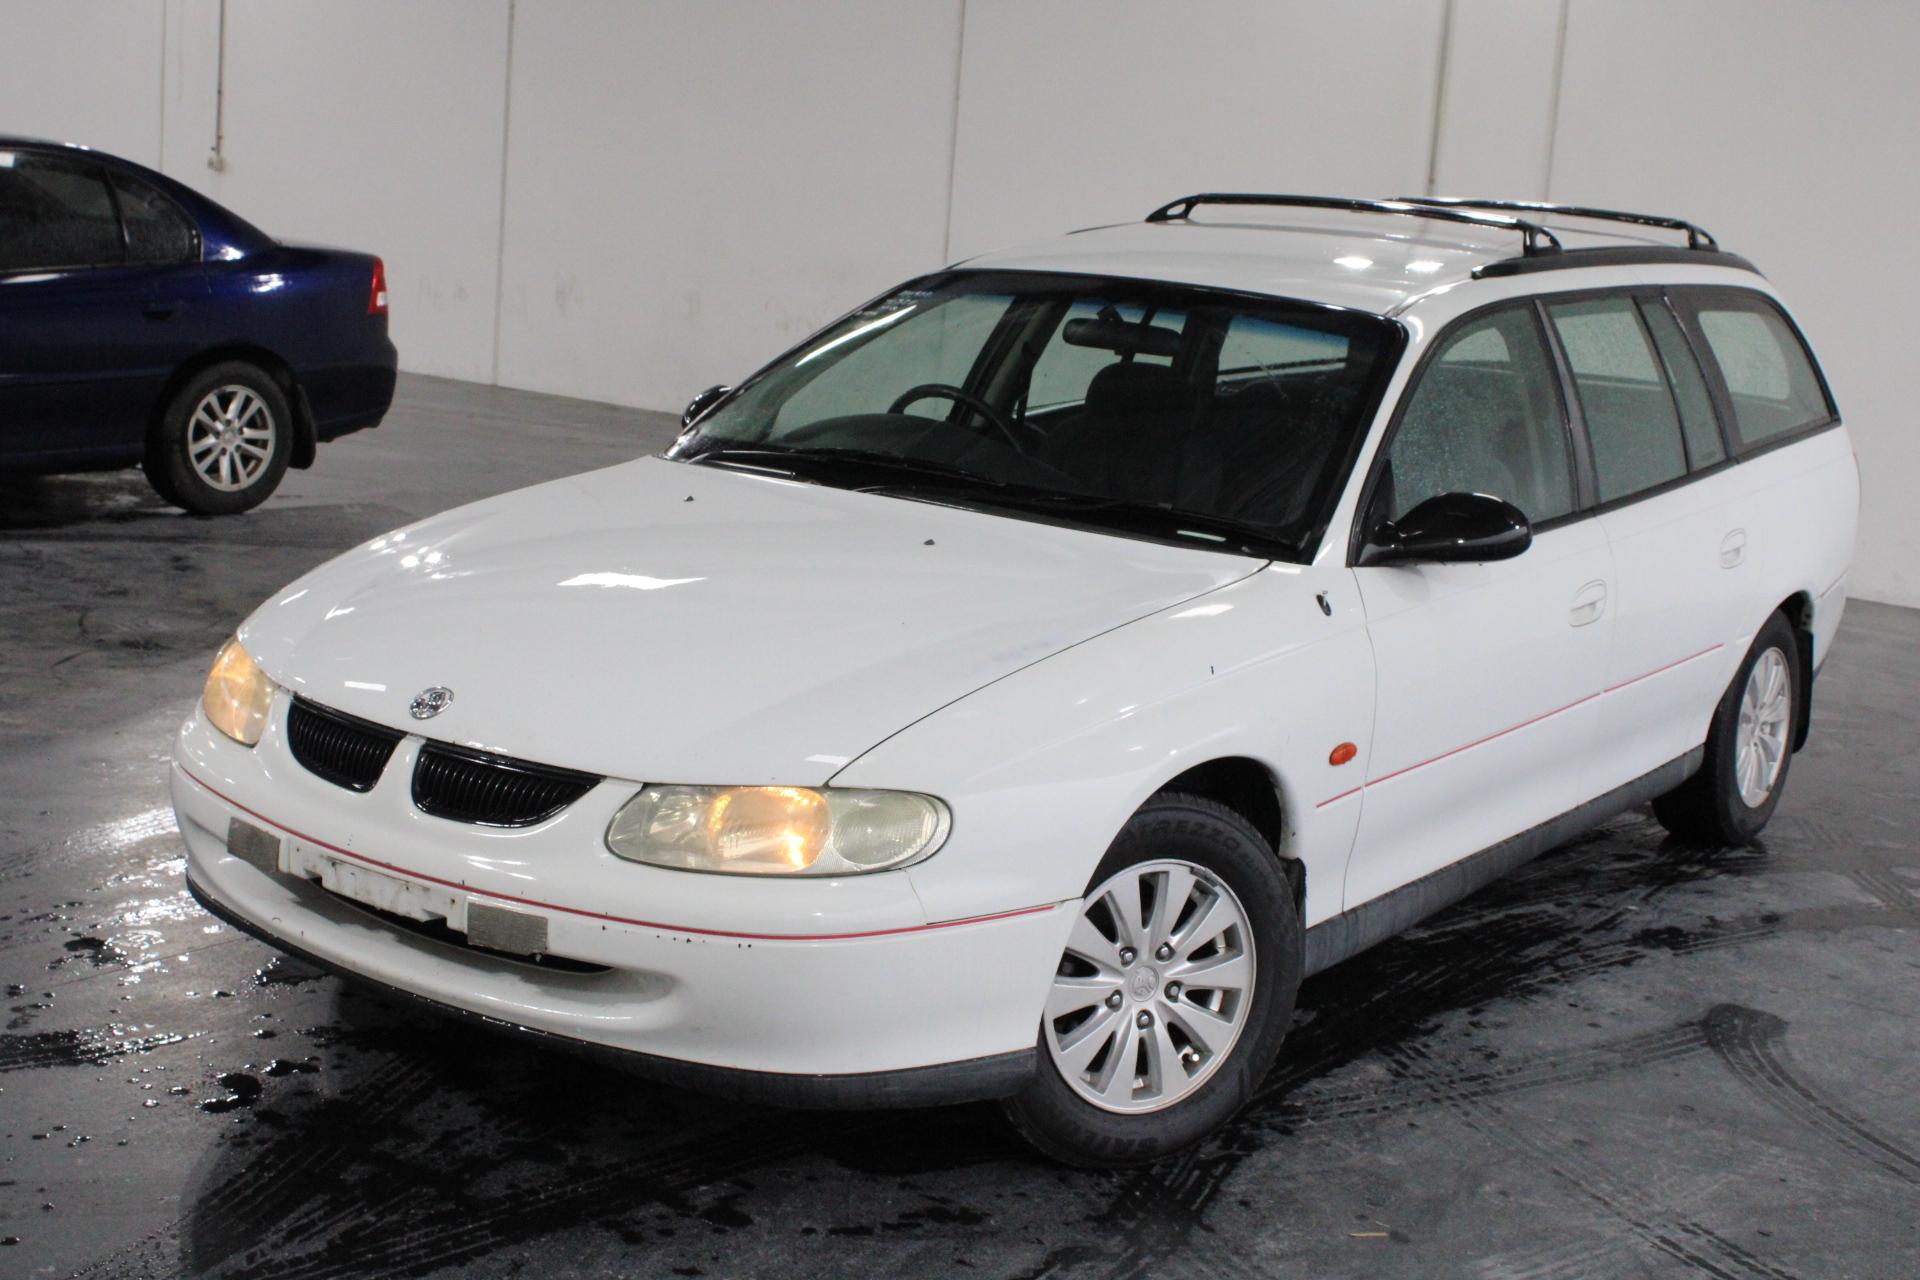 1998 Holden Commodore Executive VT Automatic Wagon